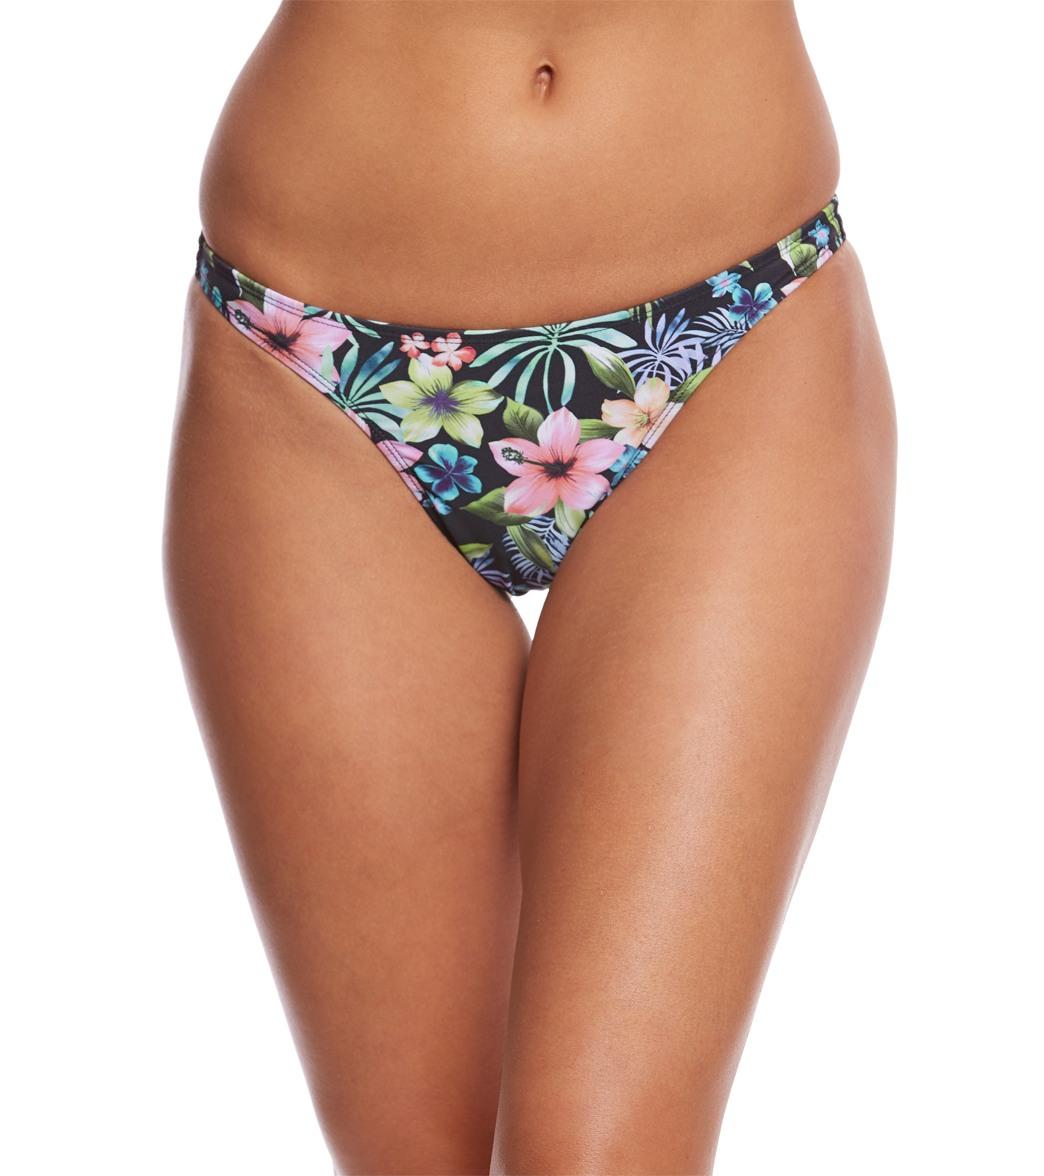 preeteens bikini Sporti Tropical Thong Bikini Swimsuit Bottom